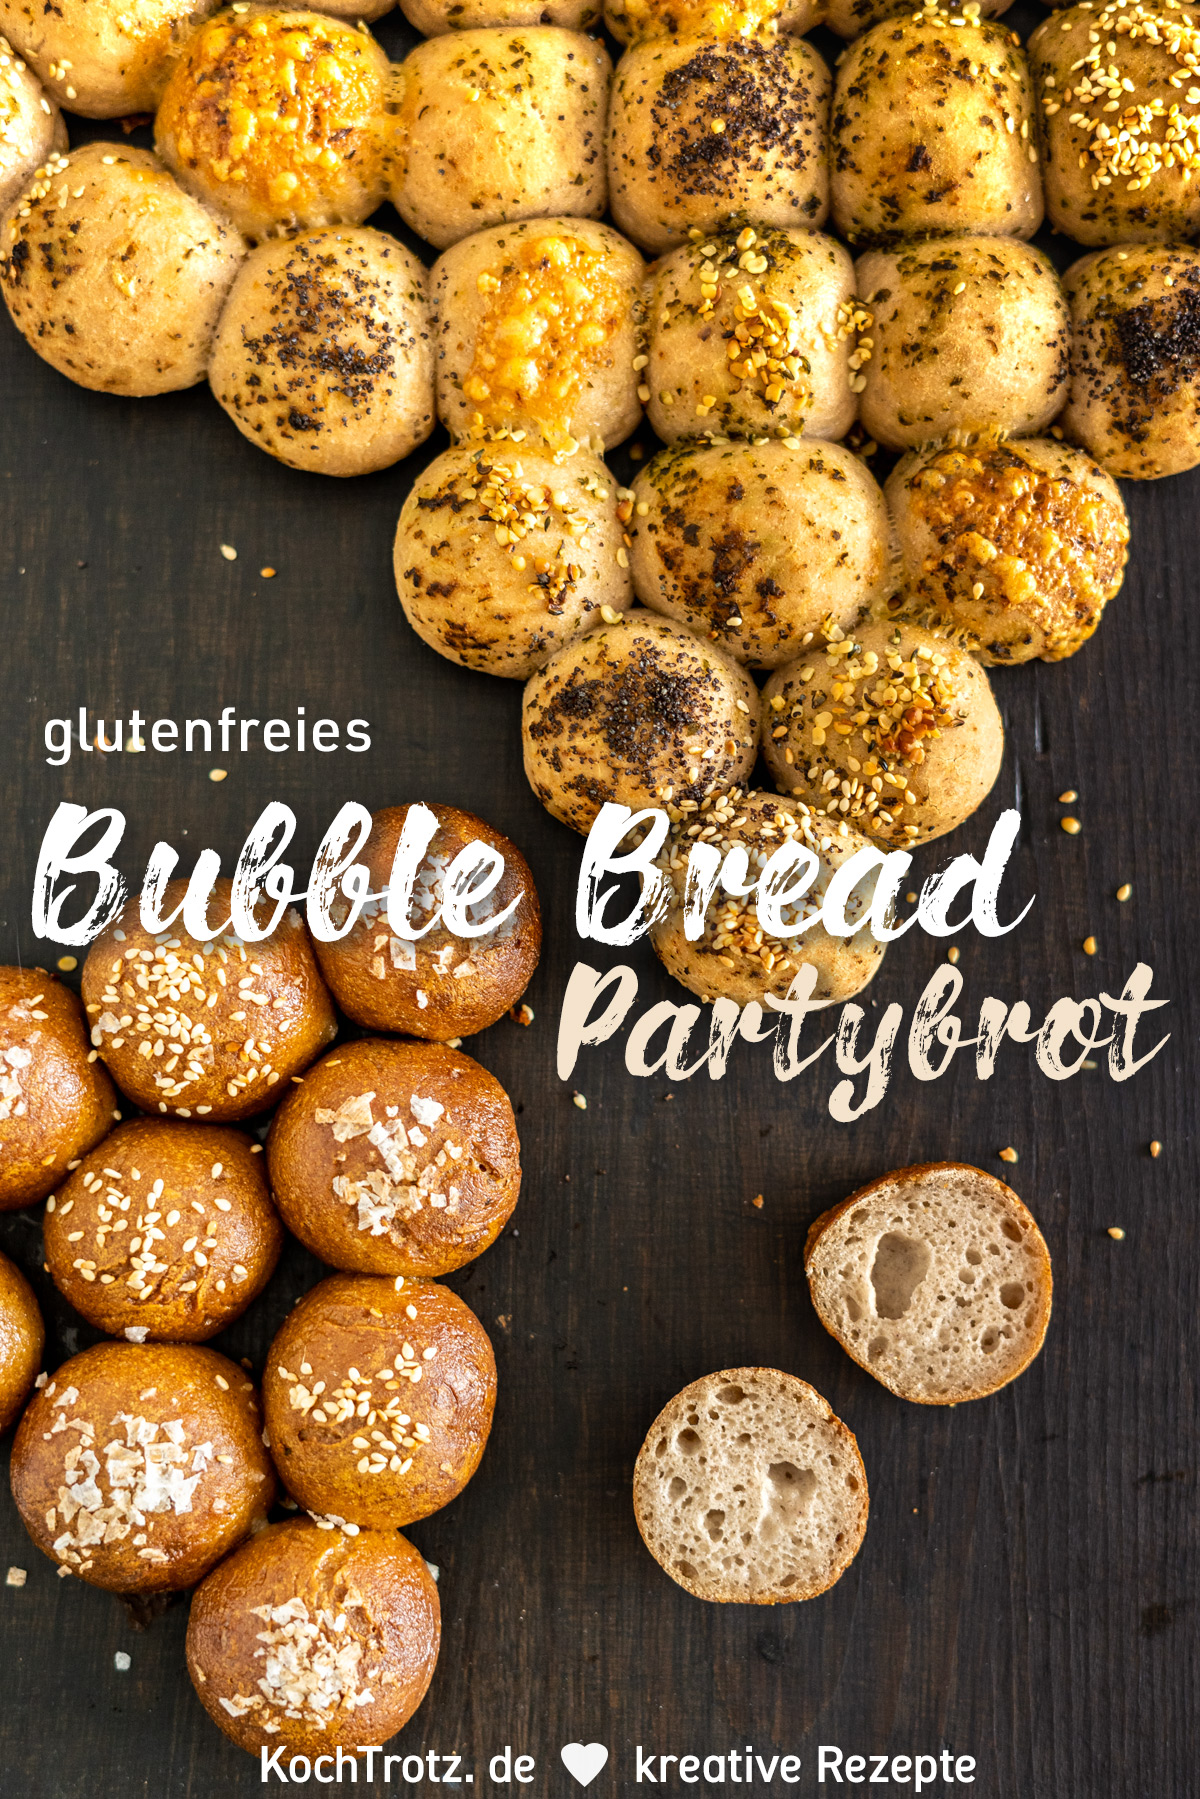 KochTrotz TOP5 in 2019 | Platz 4 | Rezept Bubble Bread | glutenfreies Partybrot ohne Fertimehlmischung